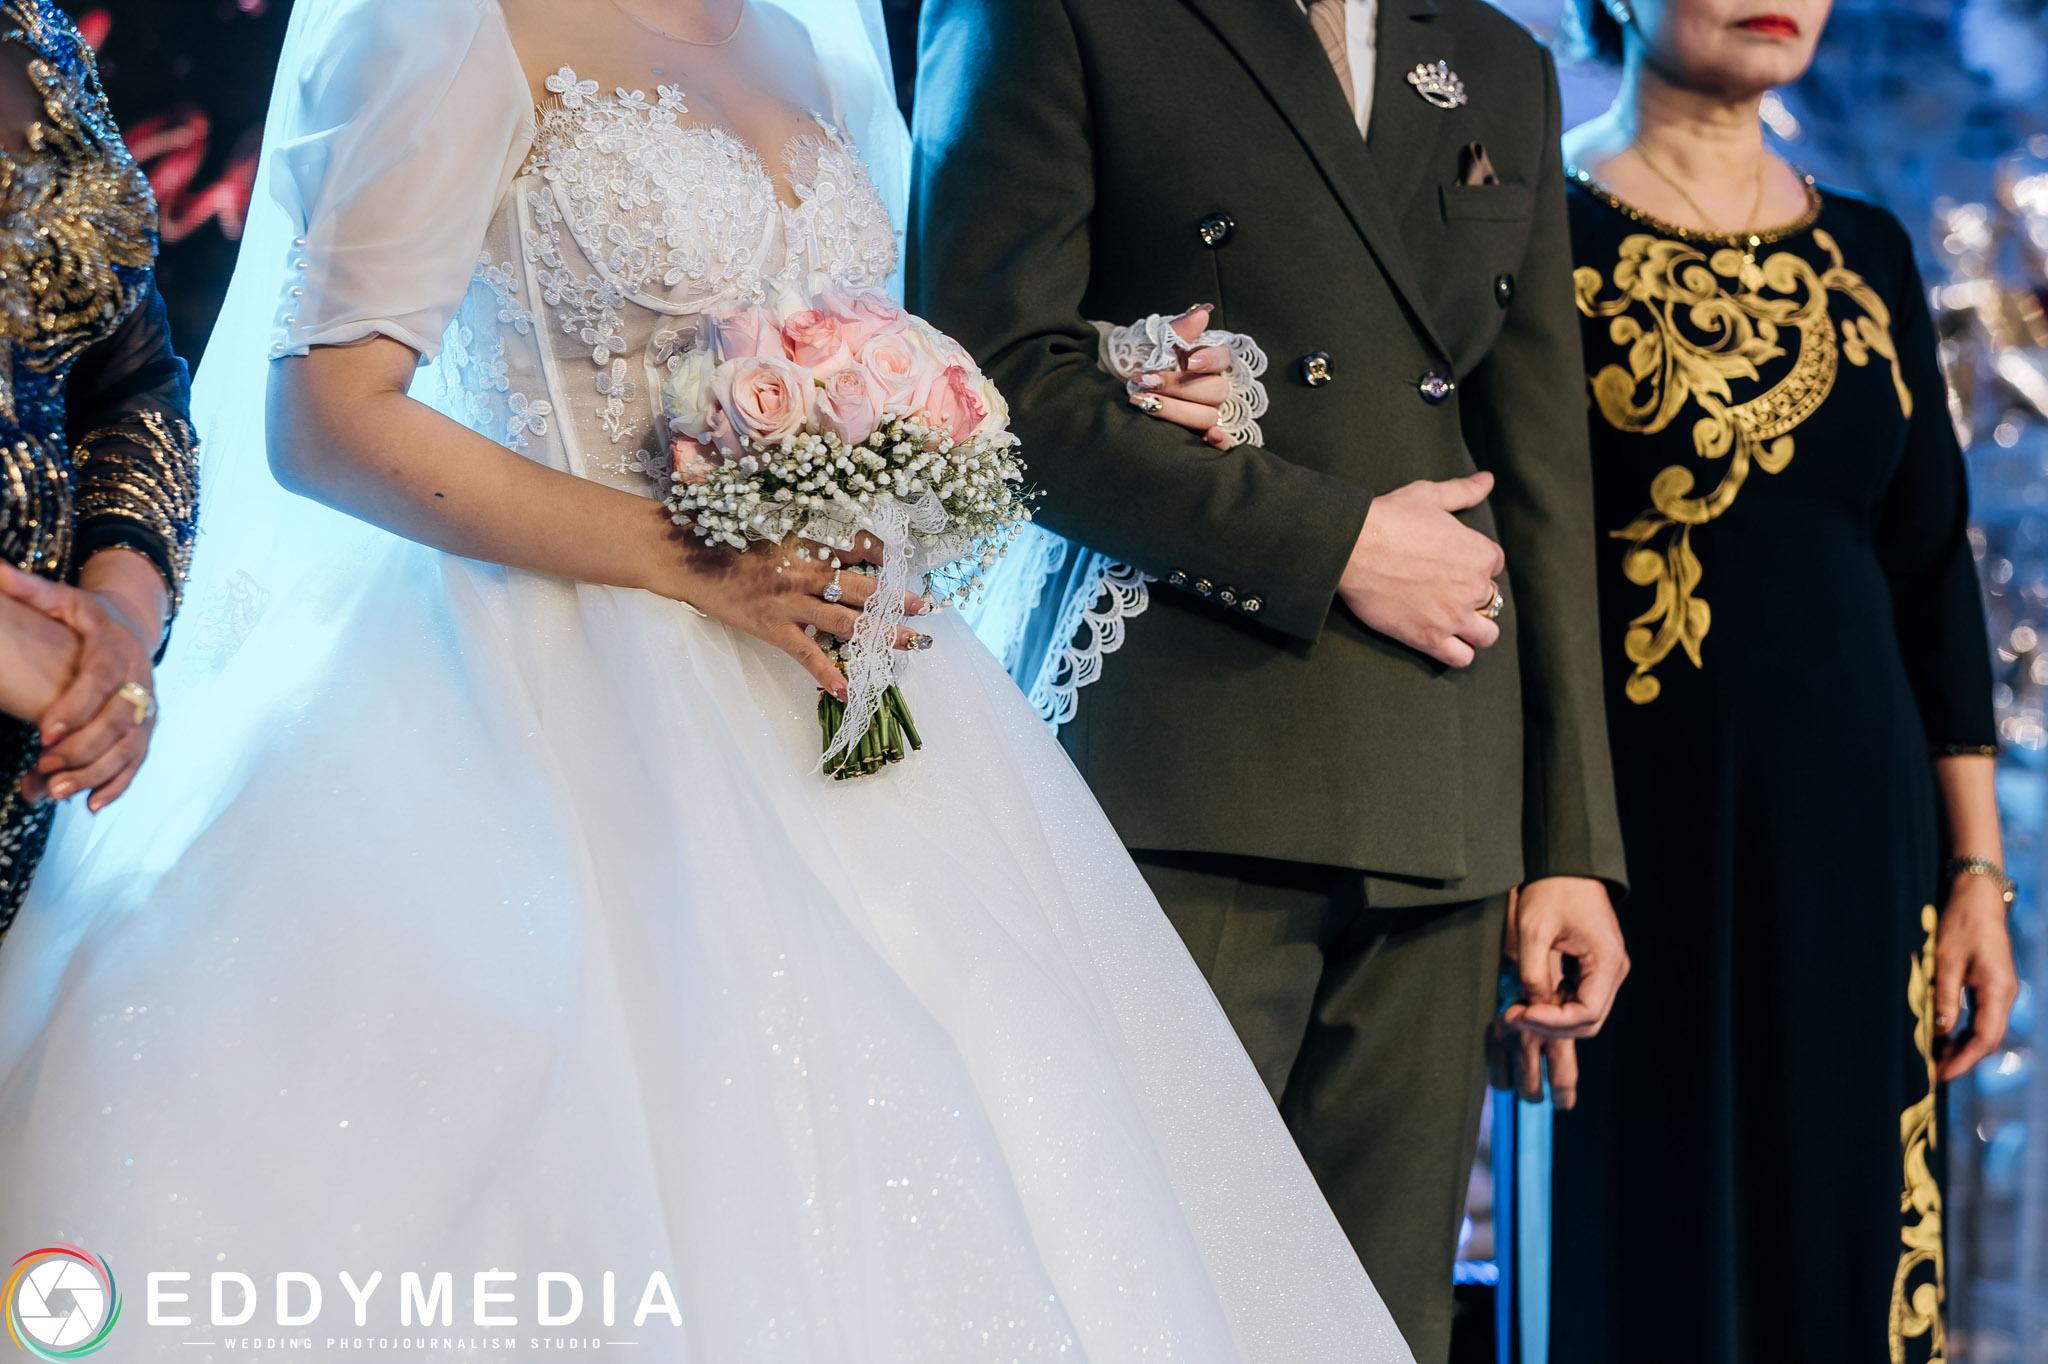 Phongsucuoi GarlicThaiNguyen DucDuong ThanhNga EddyMedia 126 yêu người kém tuổi,lấy chồng kém tuổi,lấy chồng kém 10 tuổi